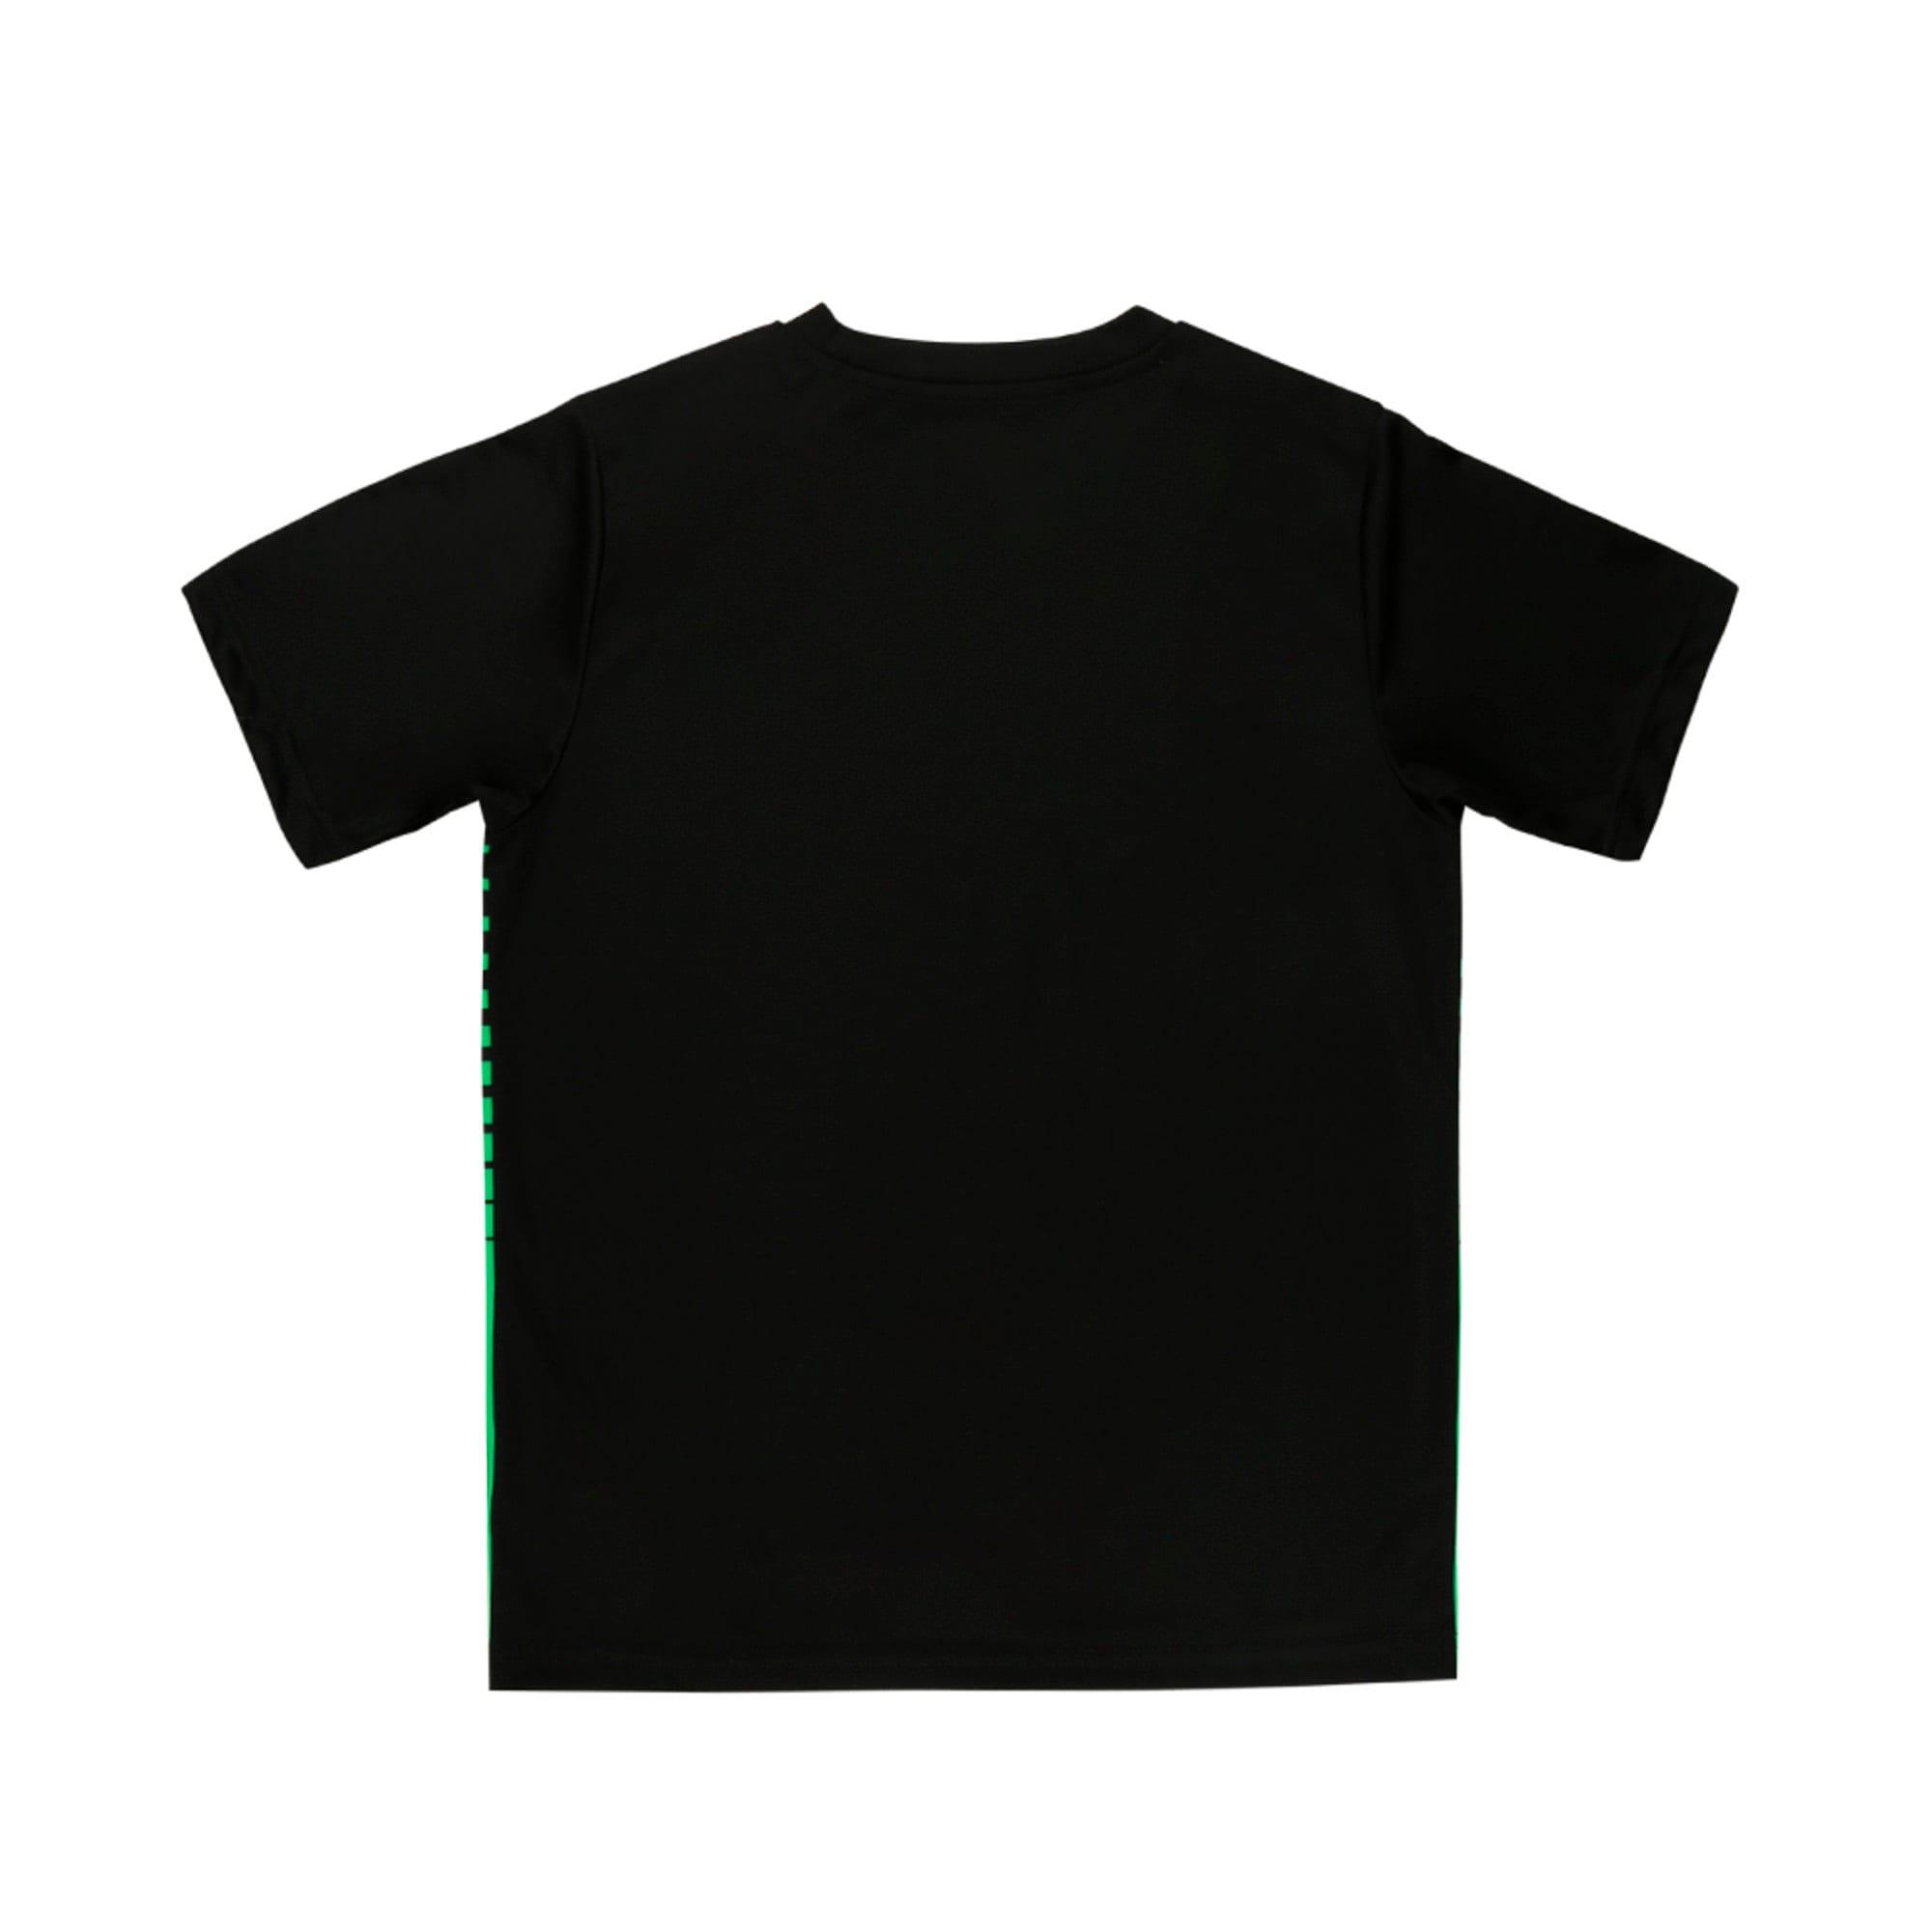 Thumbnail 2 of ftblPLAY Graphic Boys' Shirt, Puma Black-ANDEAN TOUCAN, medium-IND